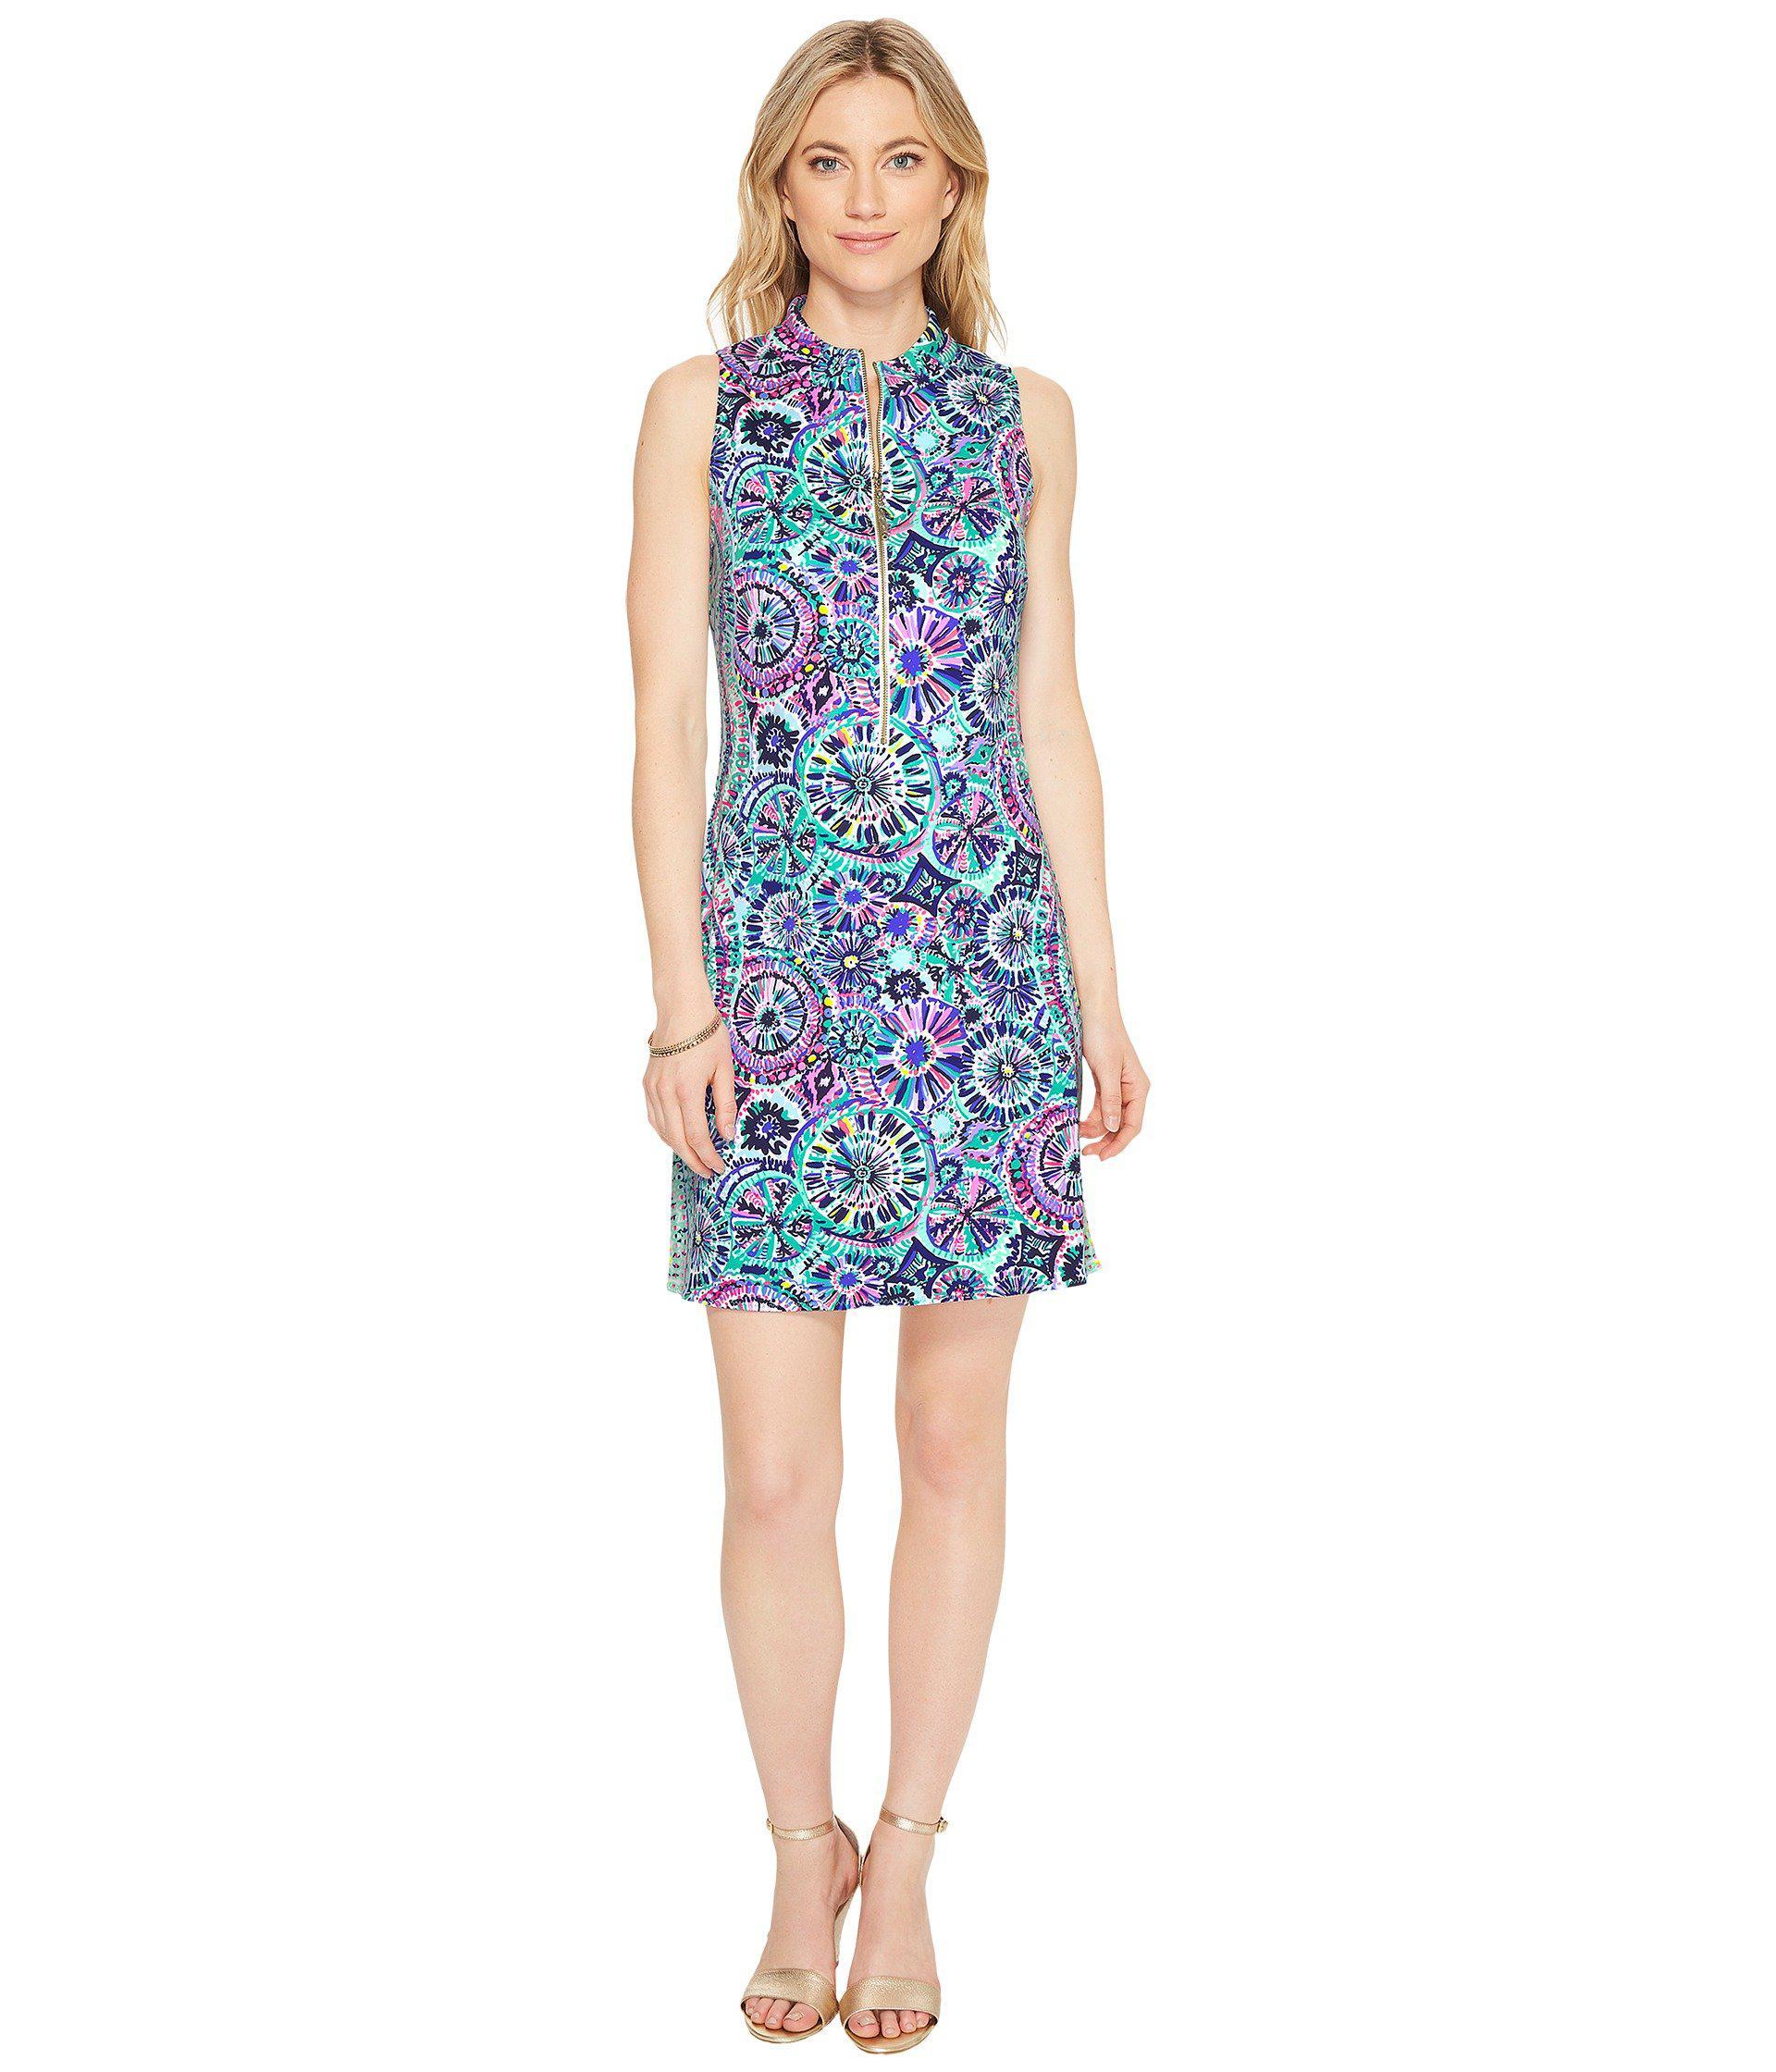 021ef47082 Lyst - Lilly Pulitzer Opal Shift Dress (multi The Swim Engineered ...